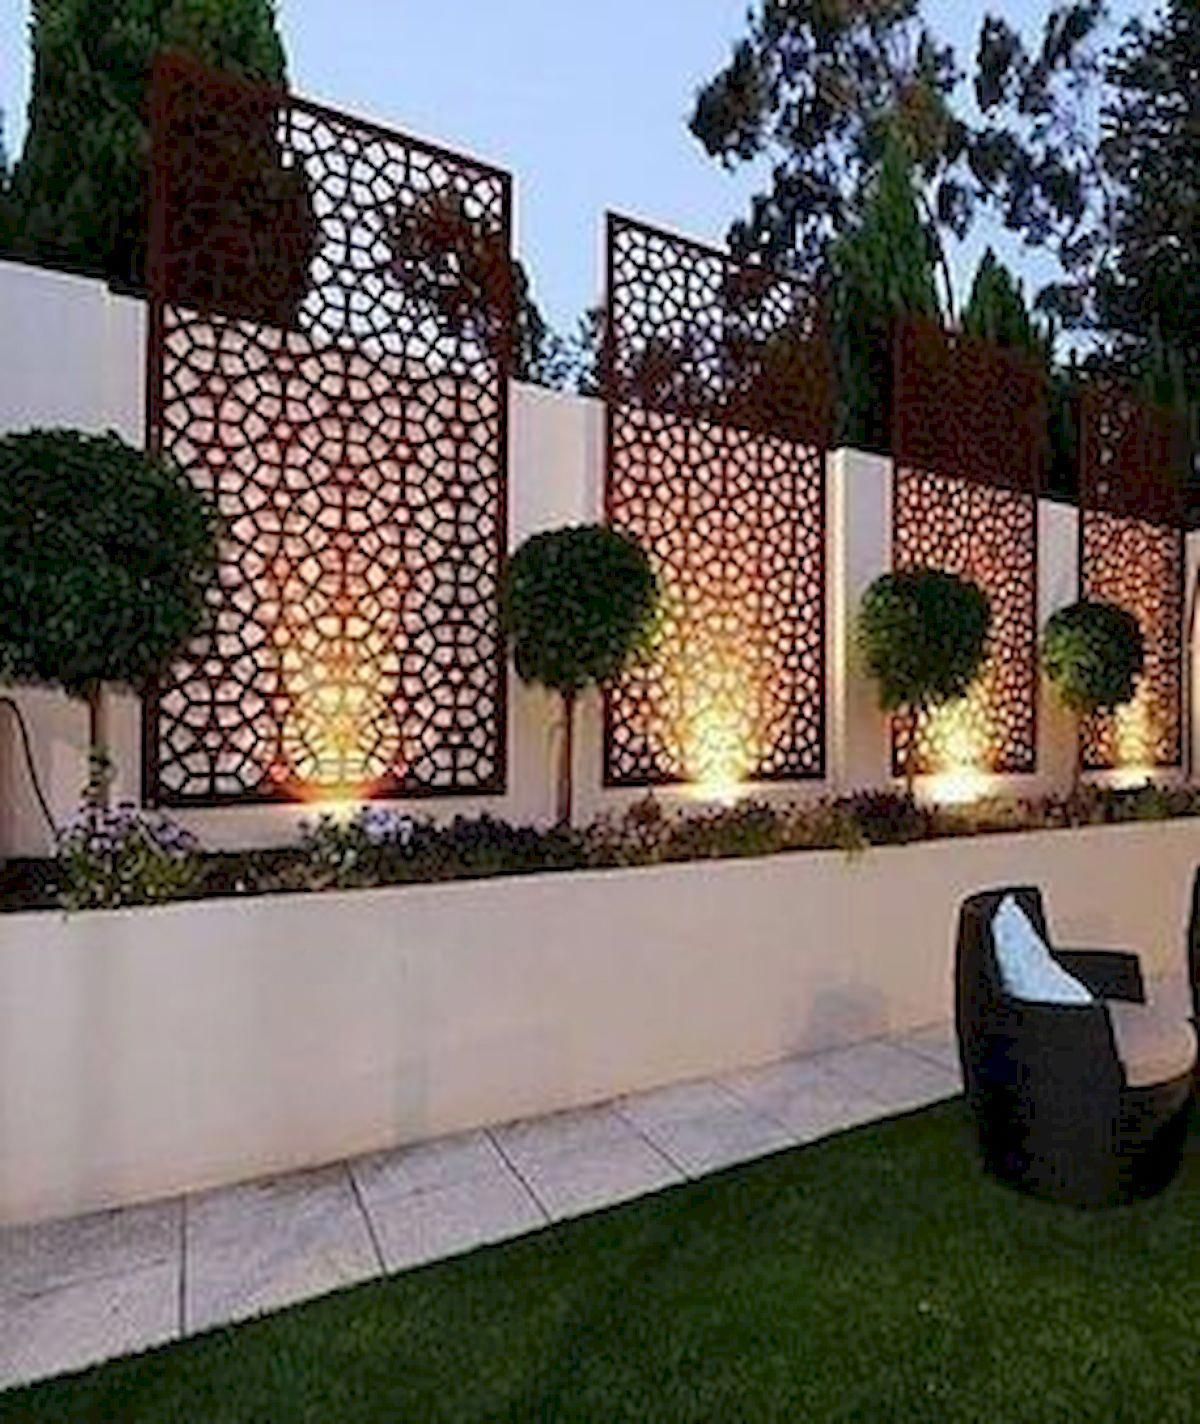 Landscape Gardening Jobs Perth Wa Small Backyard Landscaping Small Garden Design Ideas Low Maintenance Outdoor Gardens Design